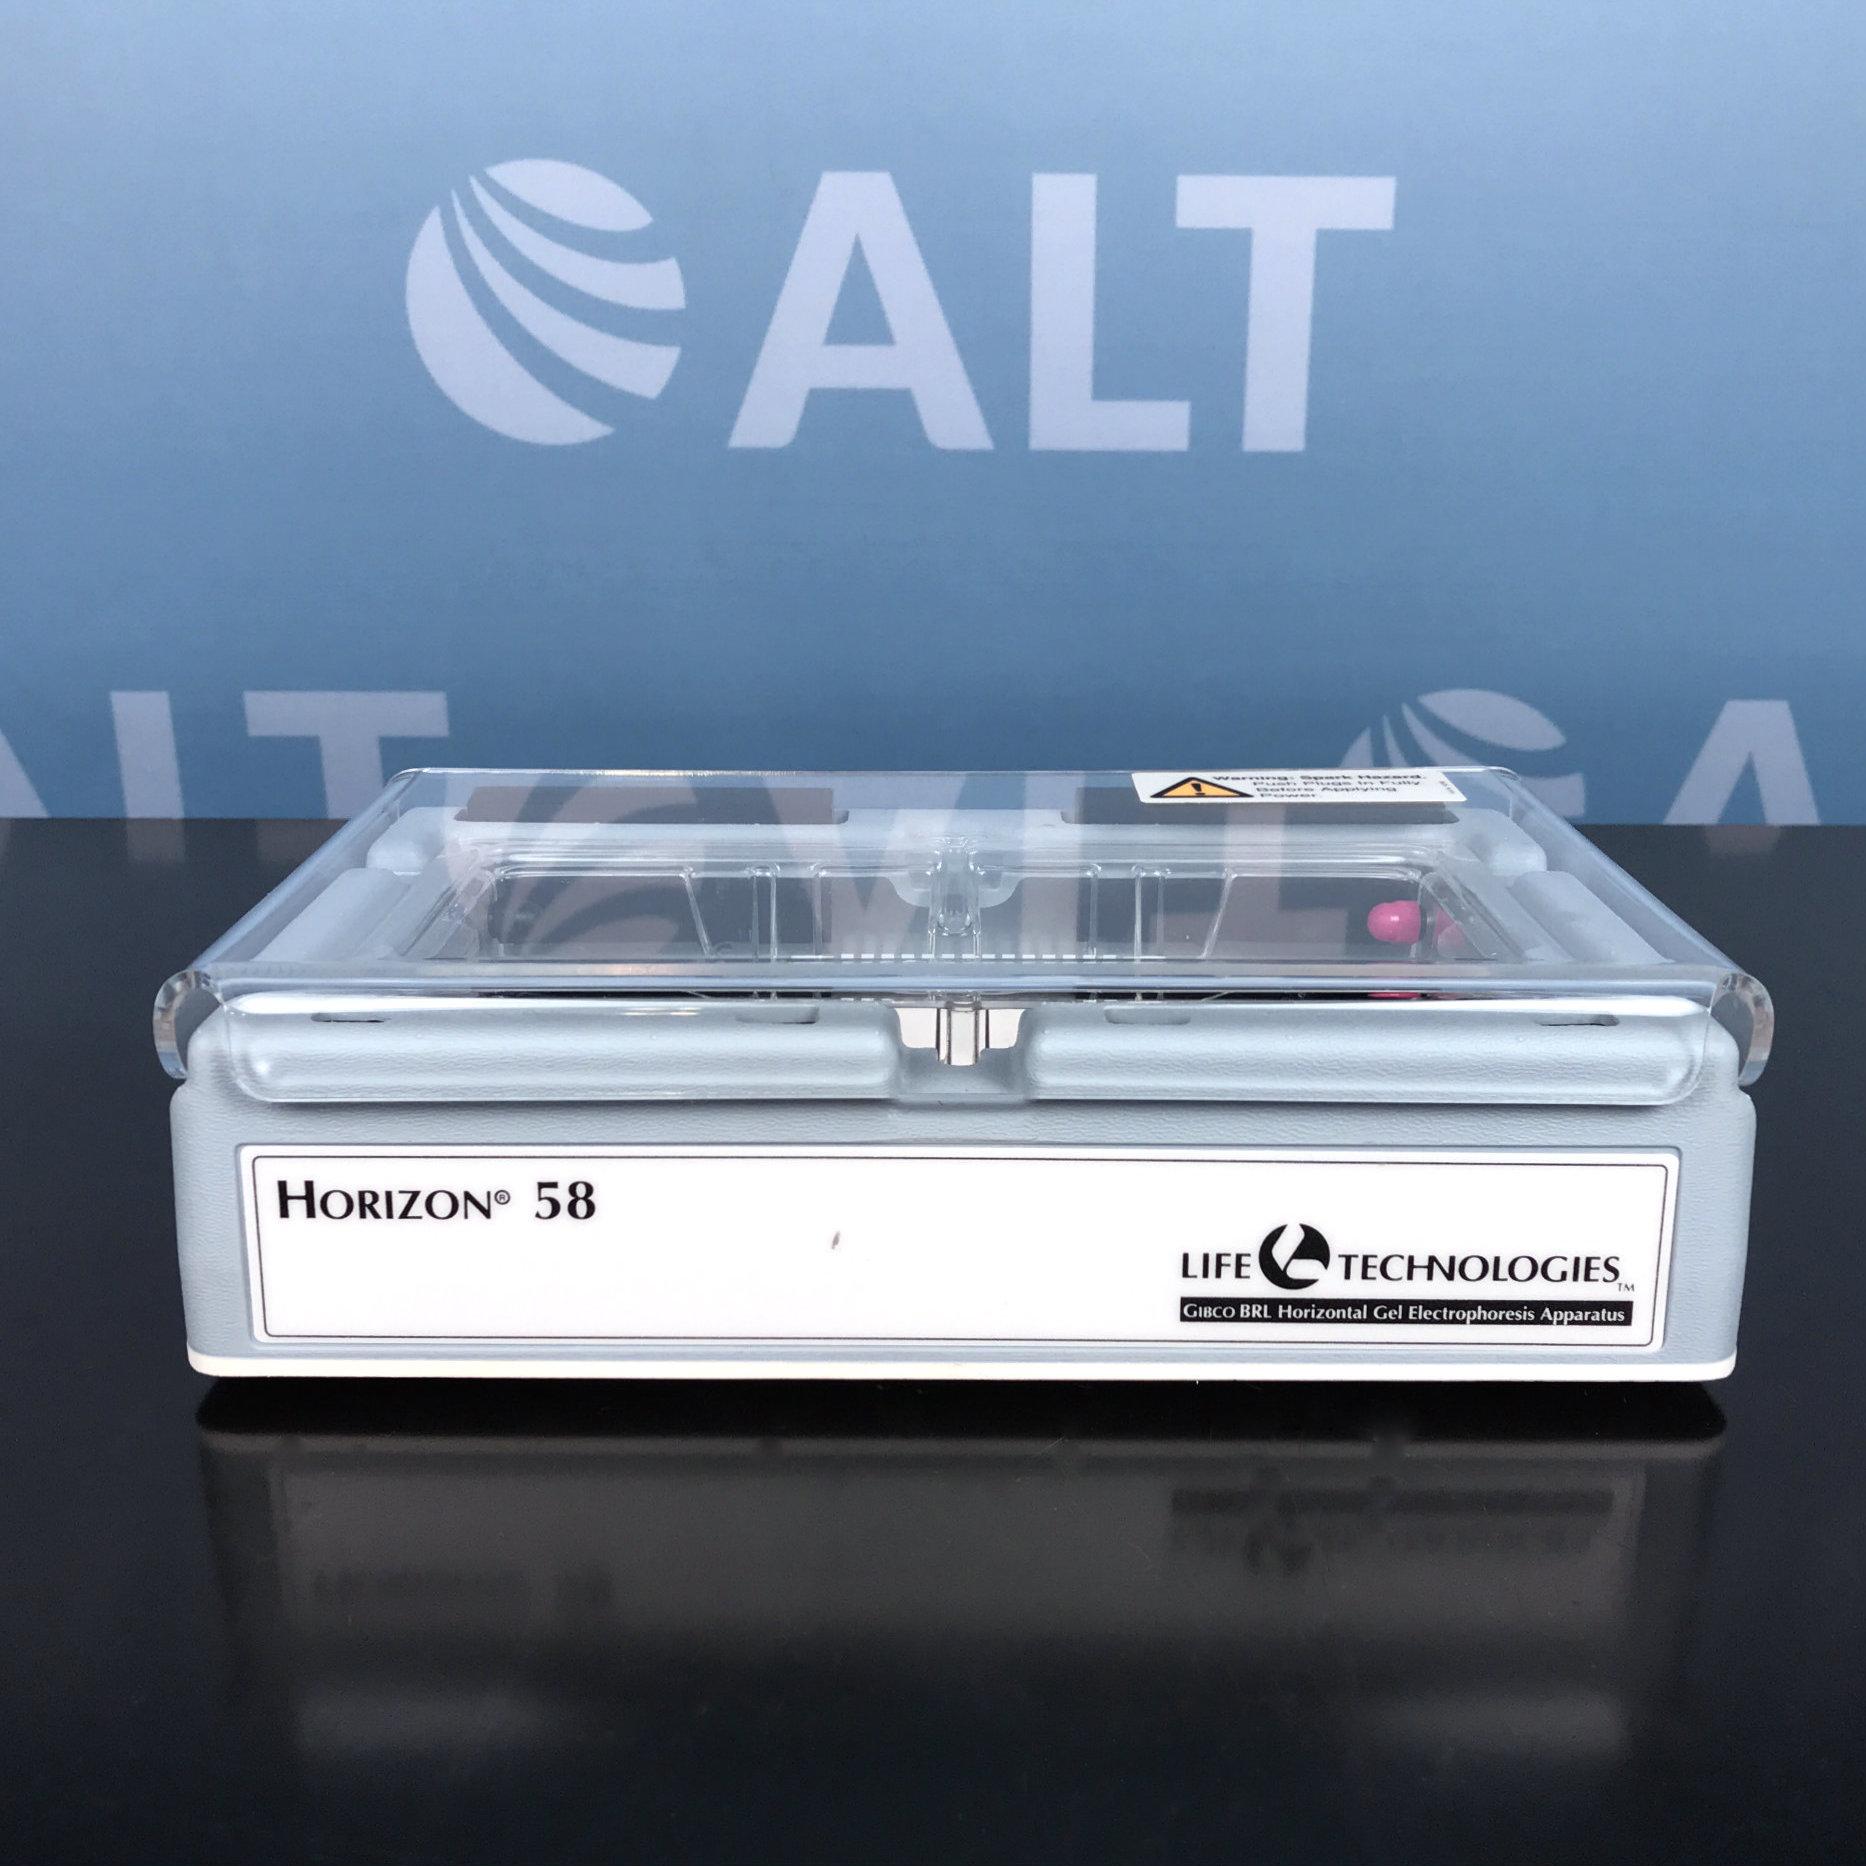 BRL/Life Technologies Horizon 58 Horizontal Gel Electrophoresis System Image